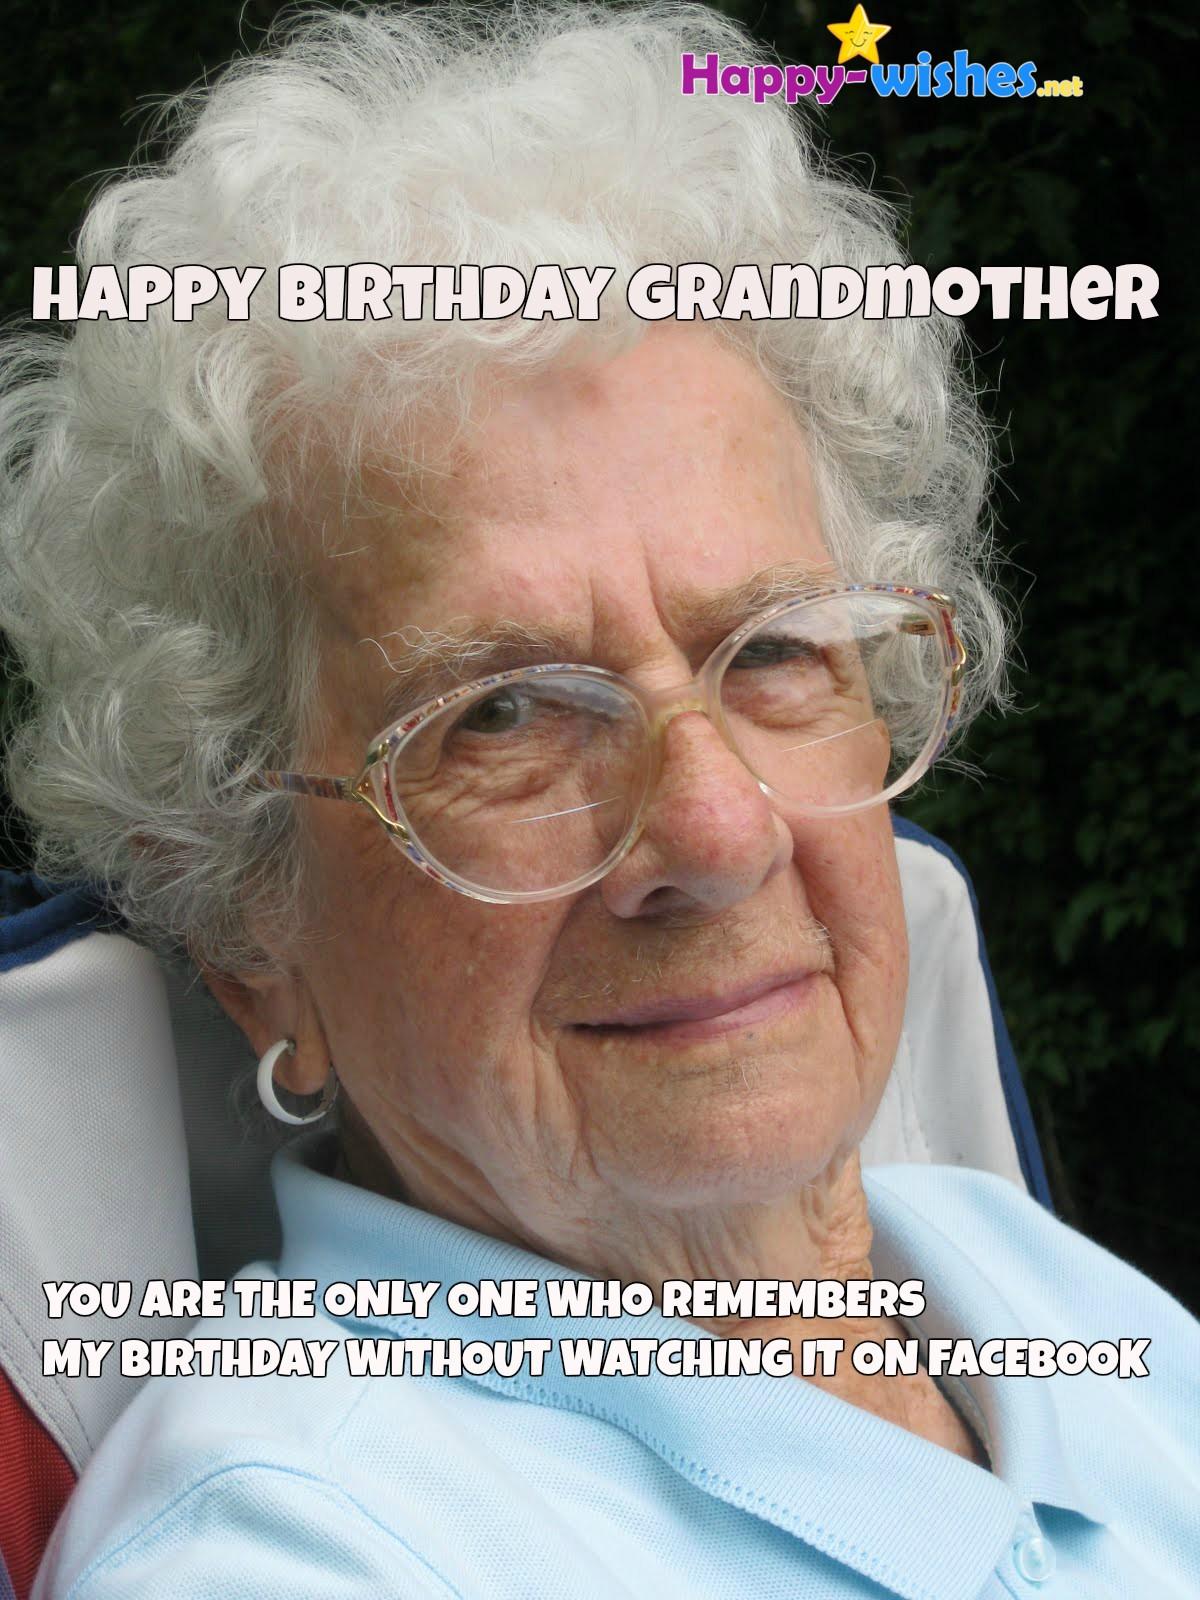 19 Amusing Grandmother Birthday Meme Images & Photos ...